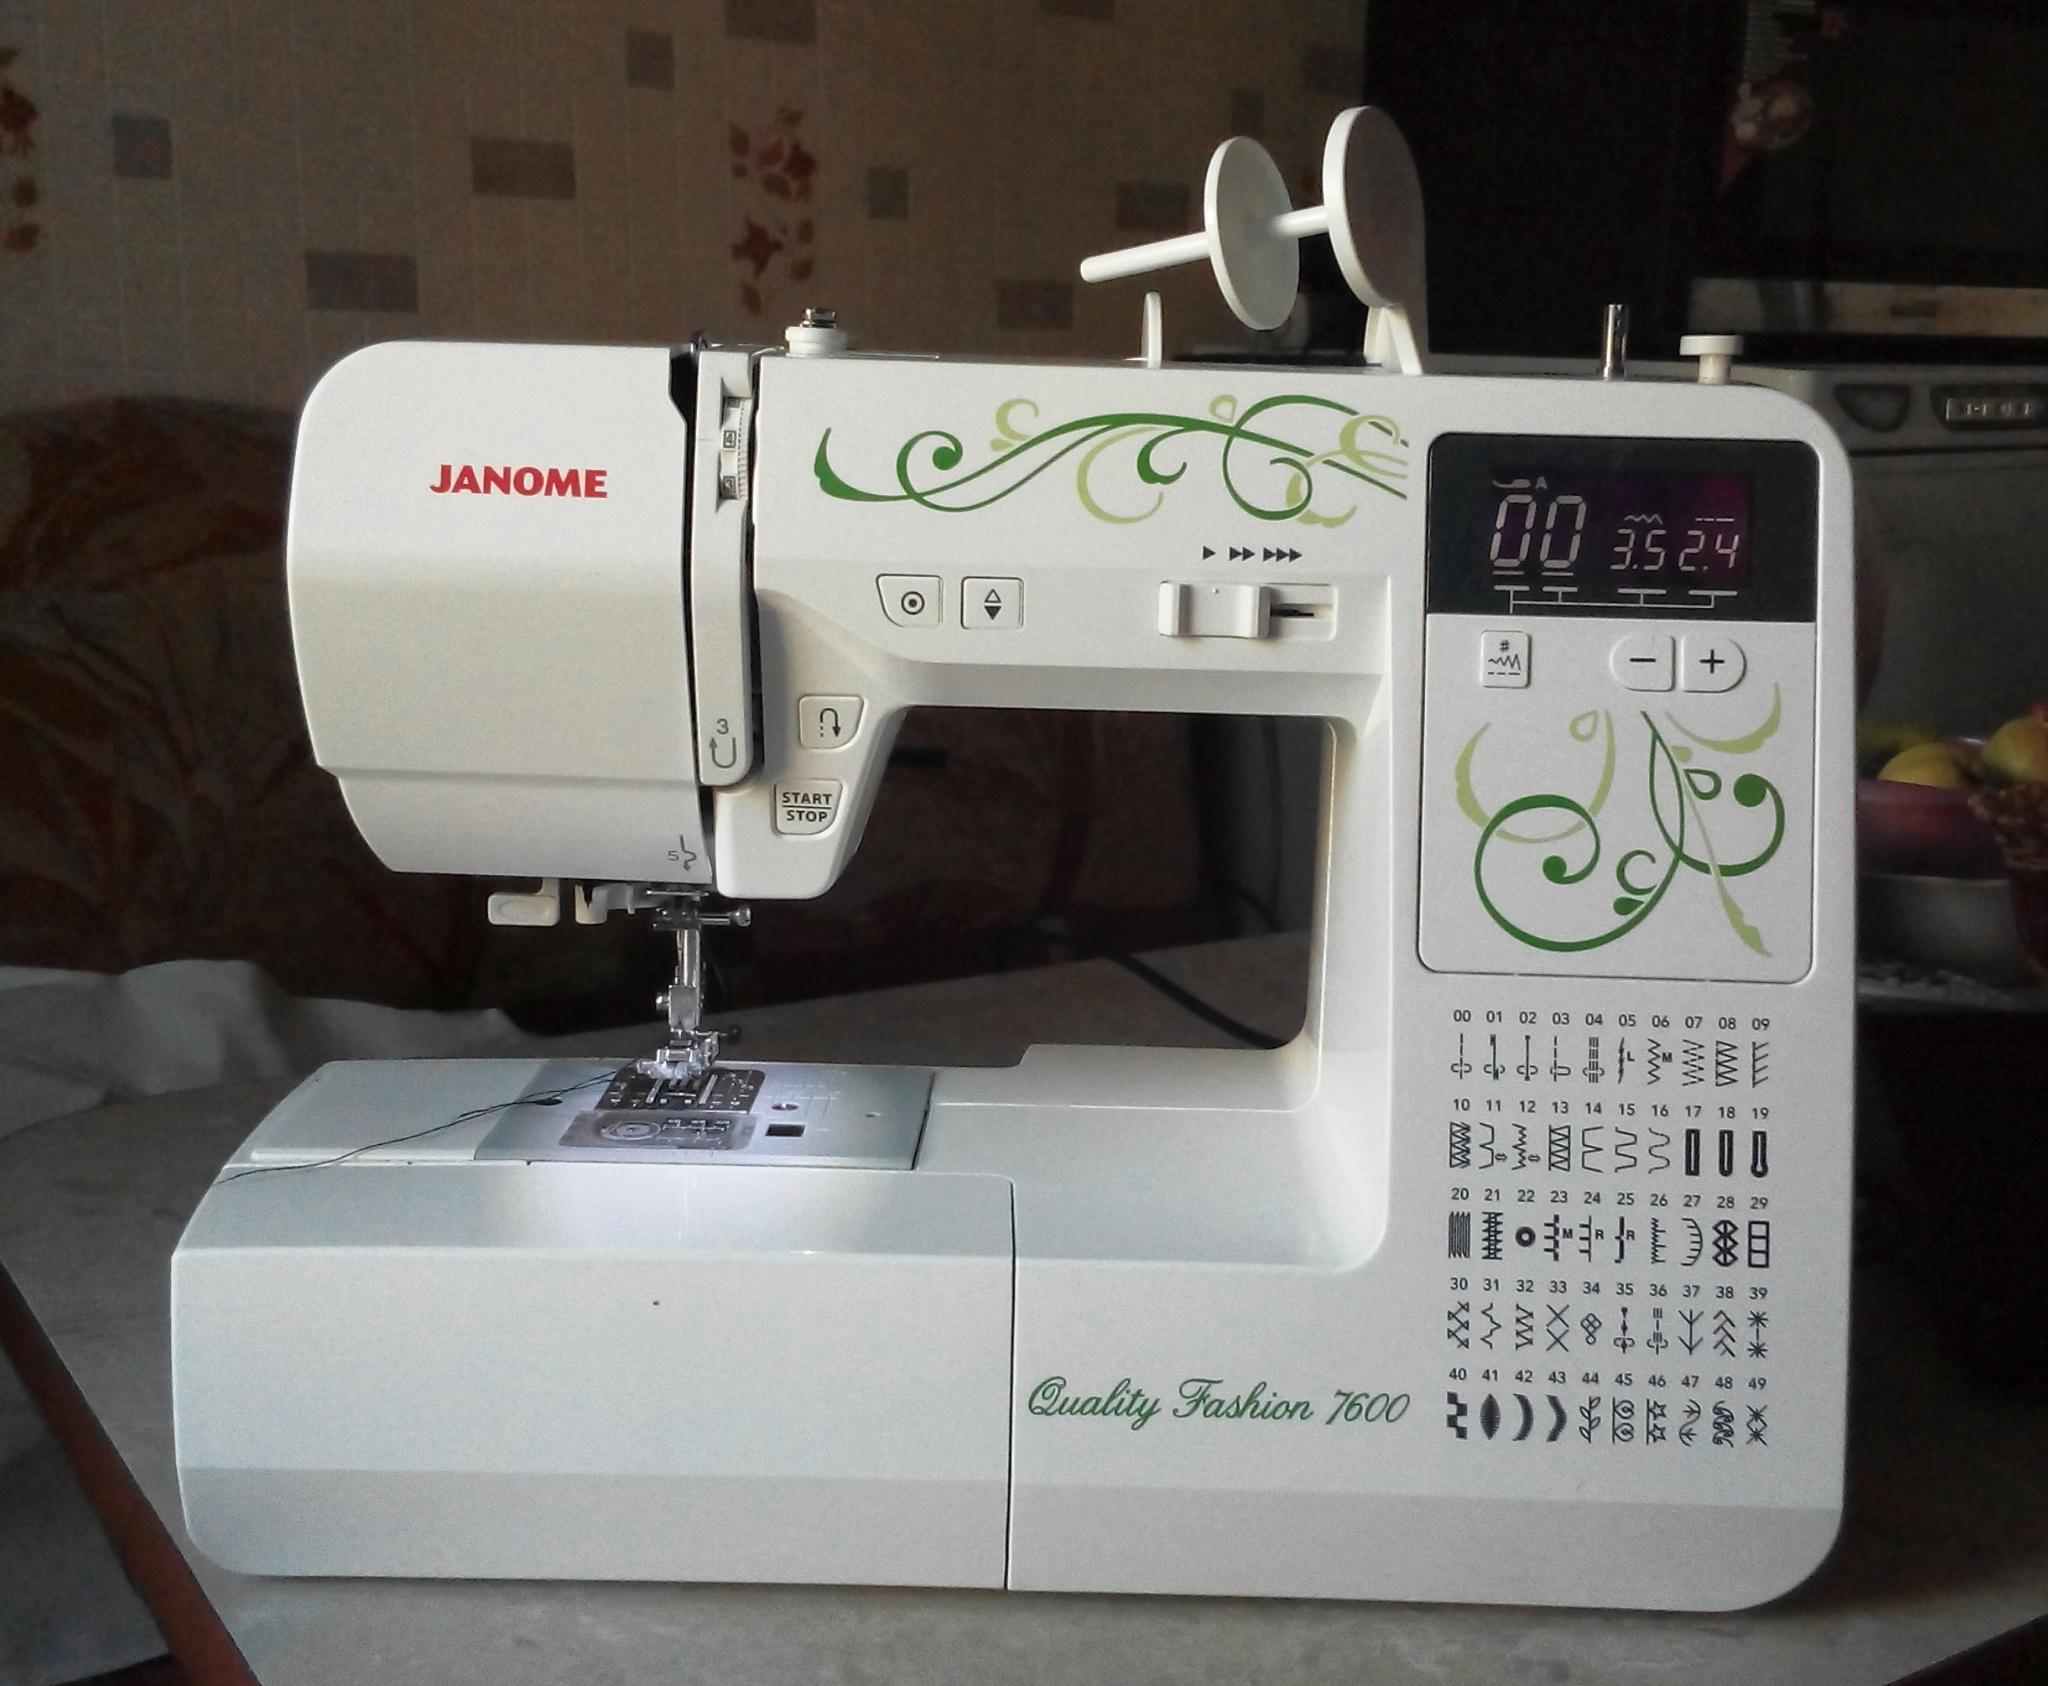 Janome quality fashion qf 7600 ercolano шкатулки оптом